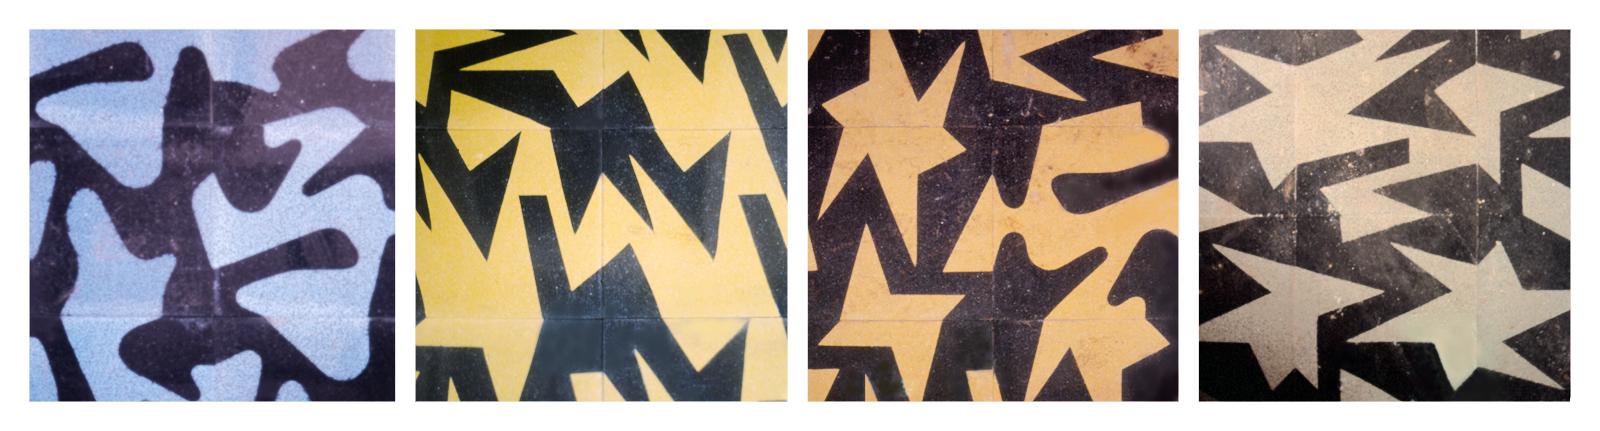 - pattern 1.jpg